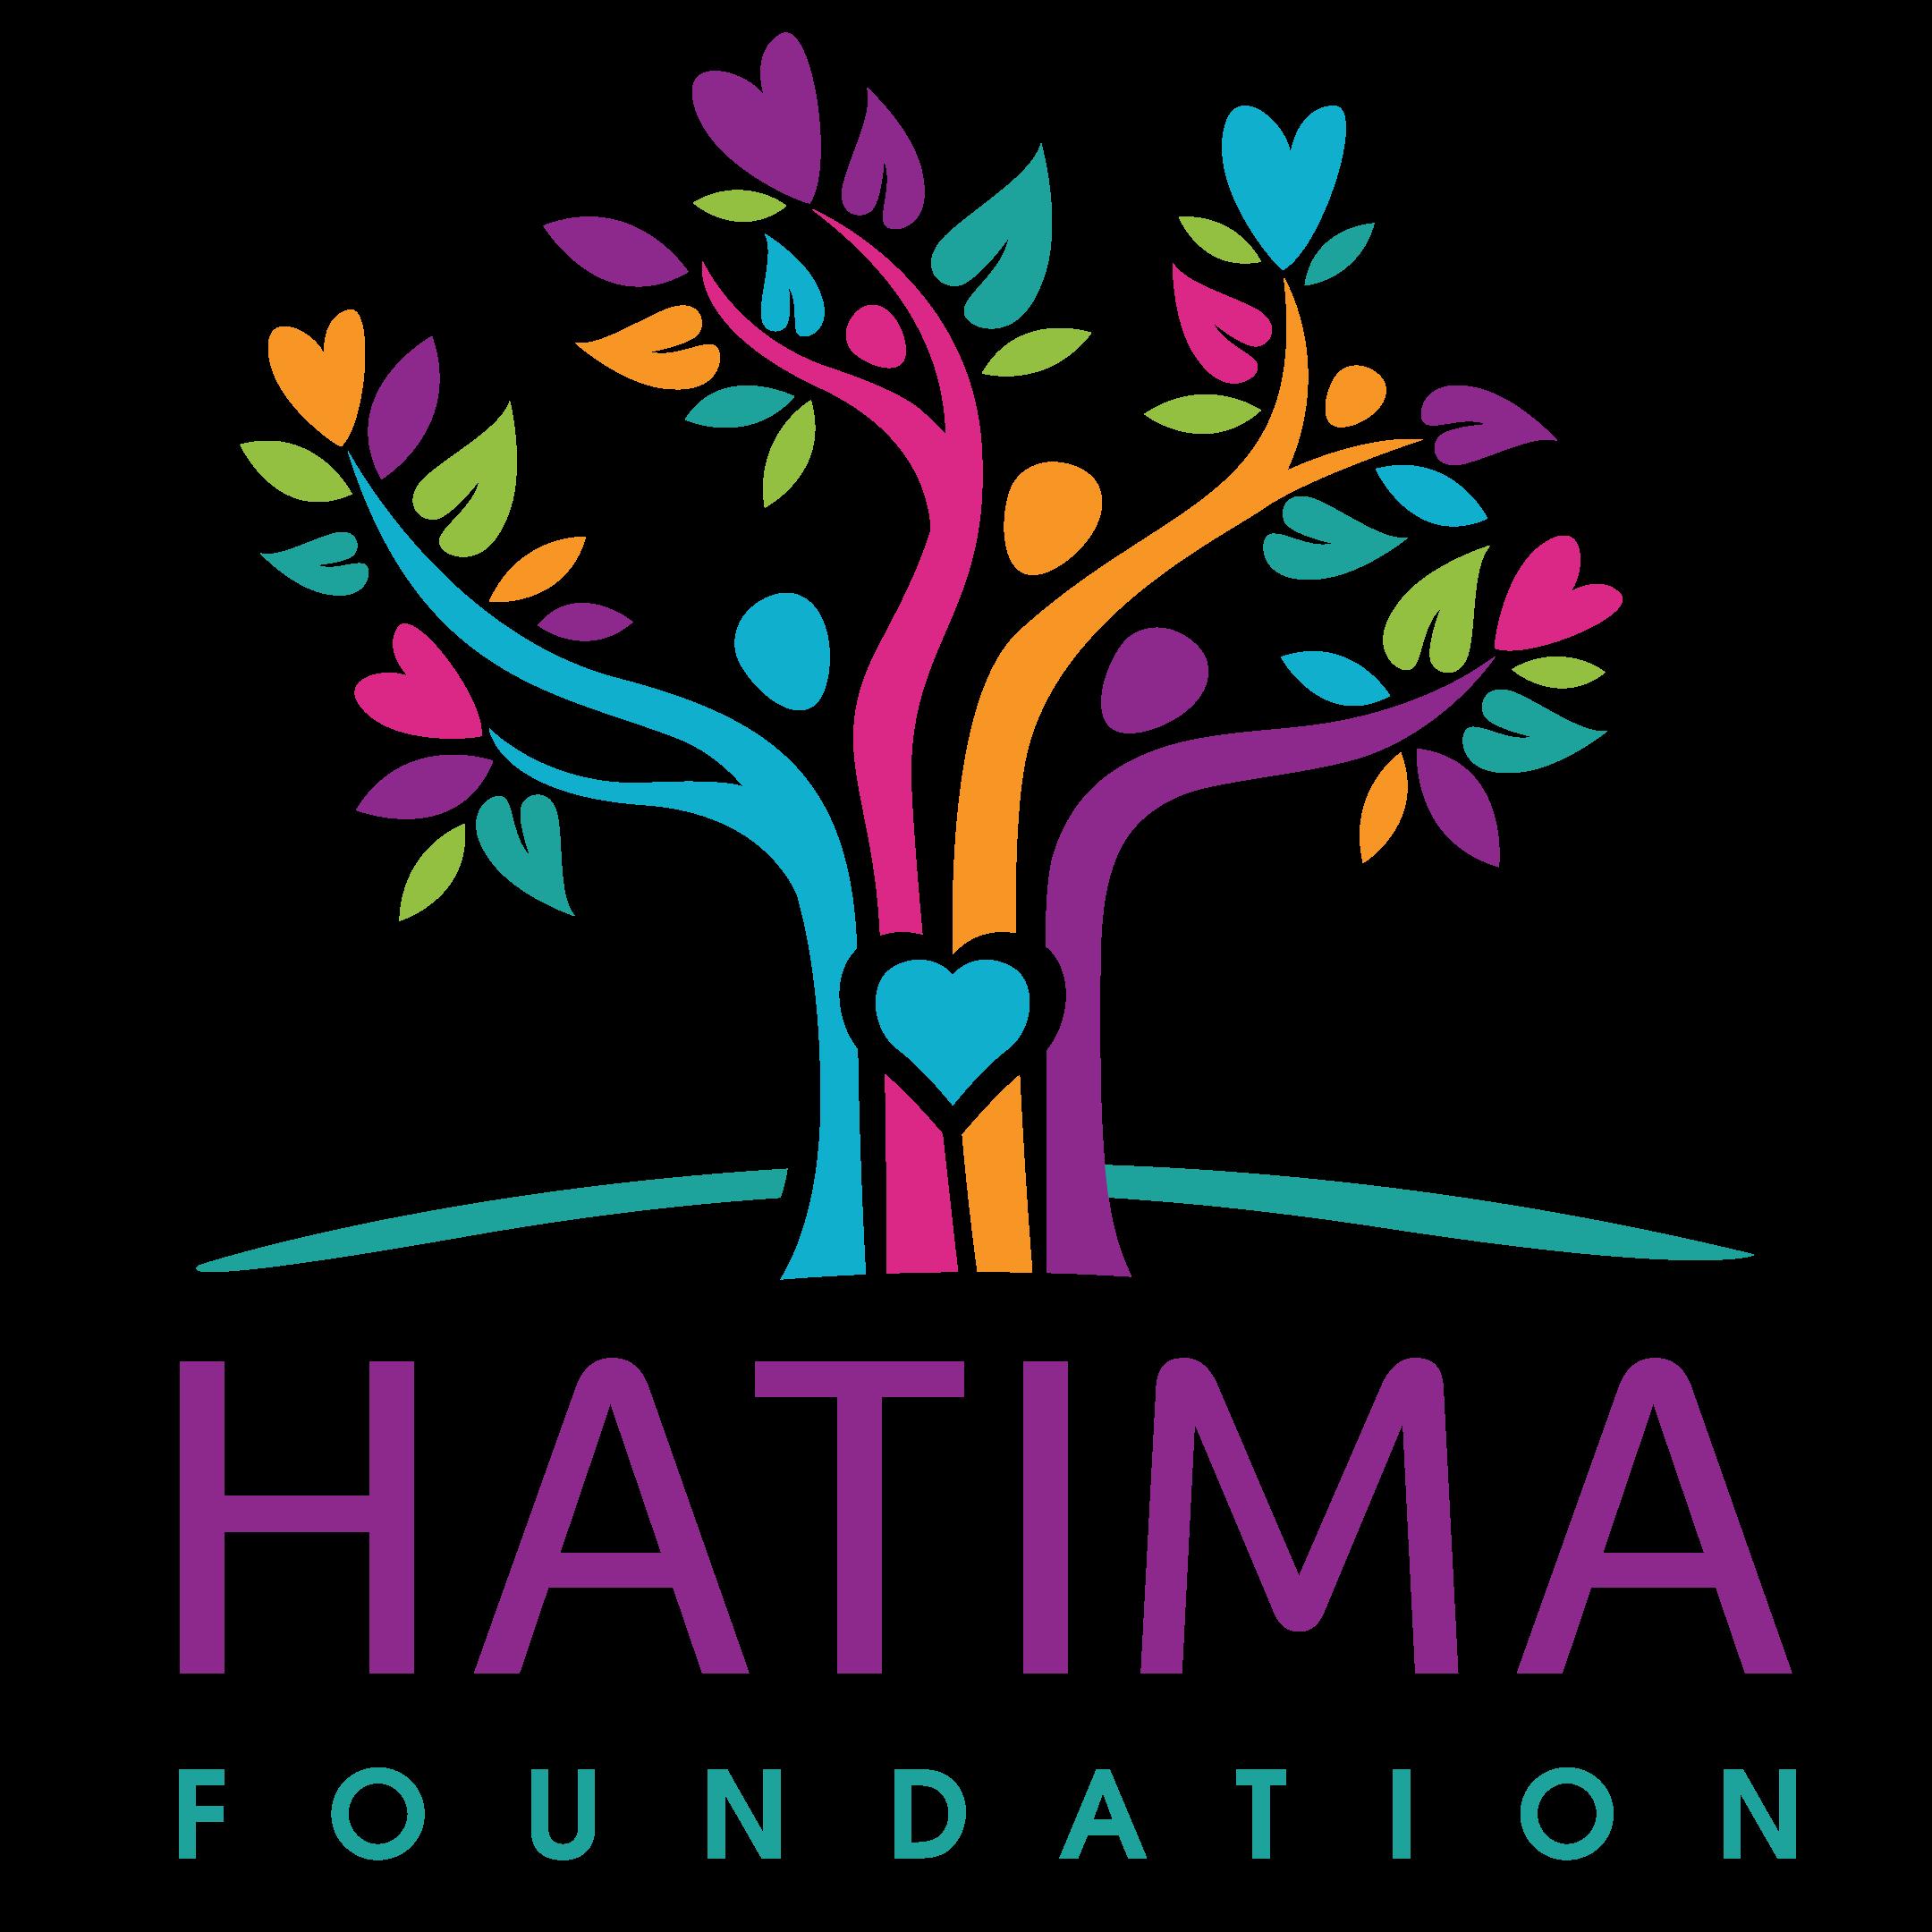 Hatima